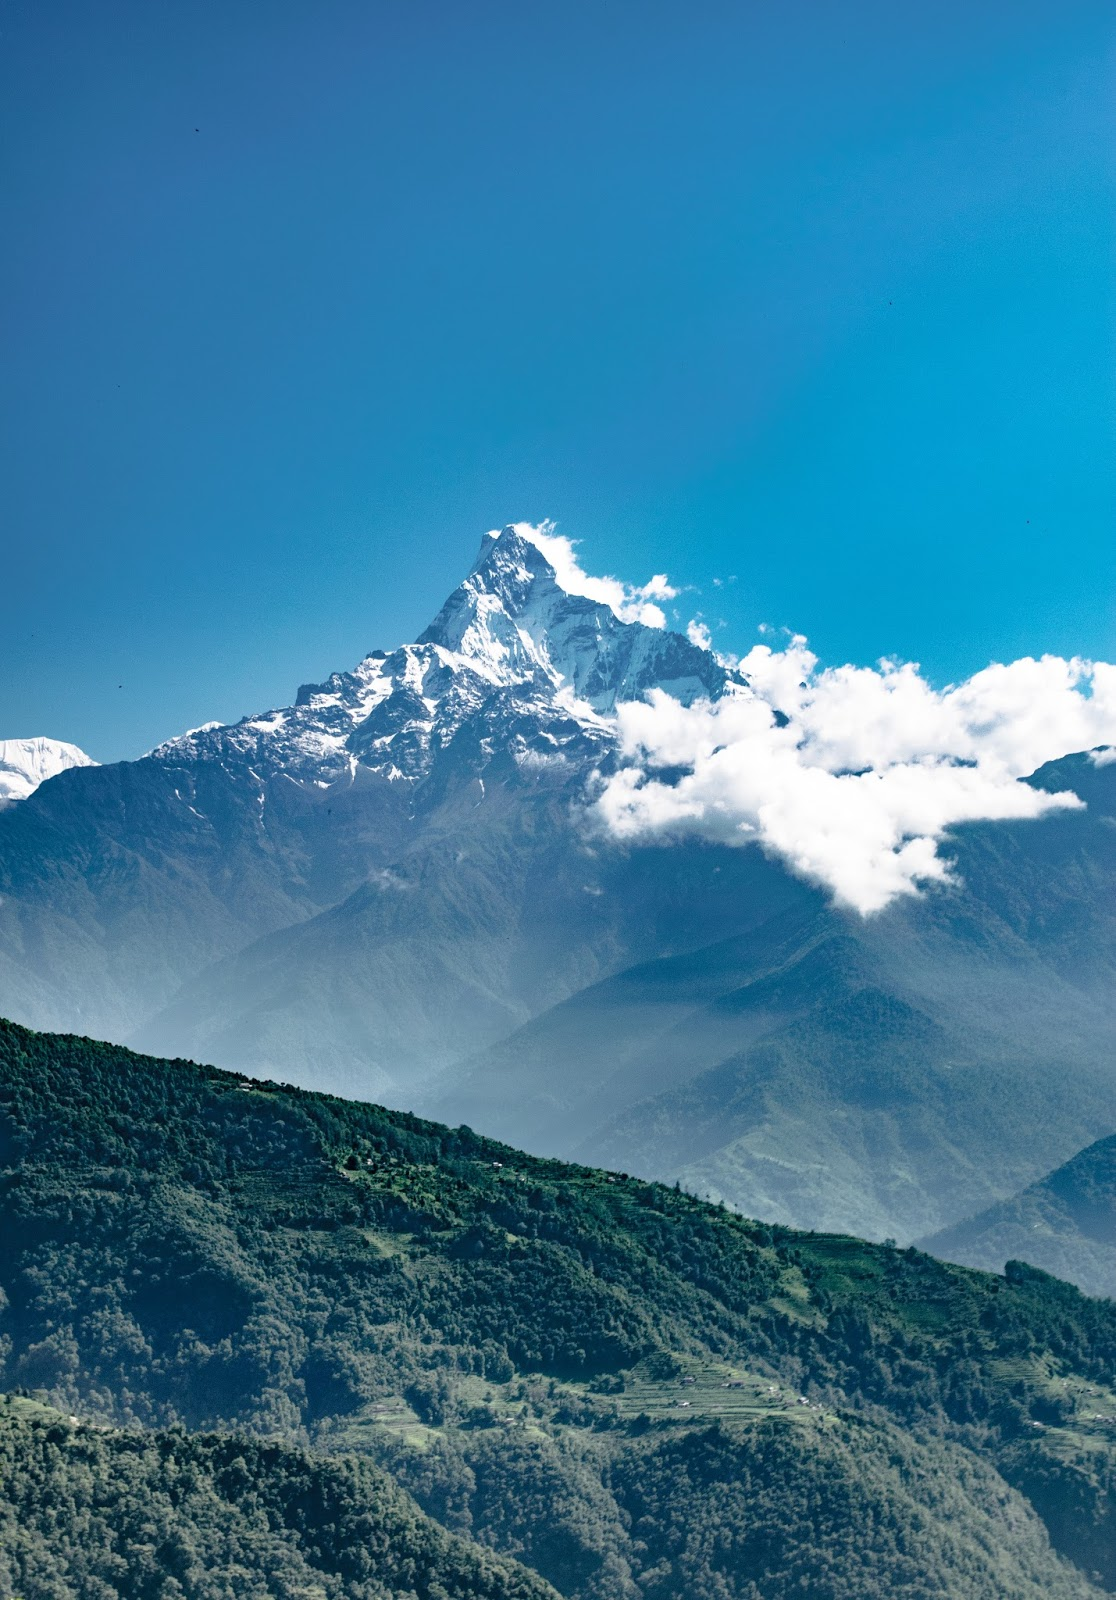 Annapurna Base Camp Trek guide